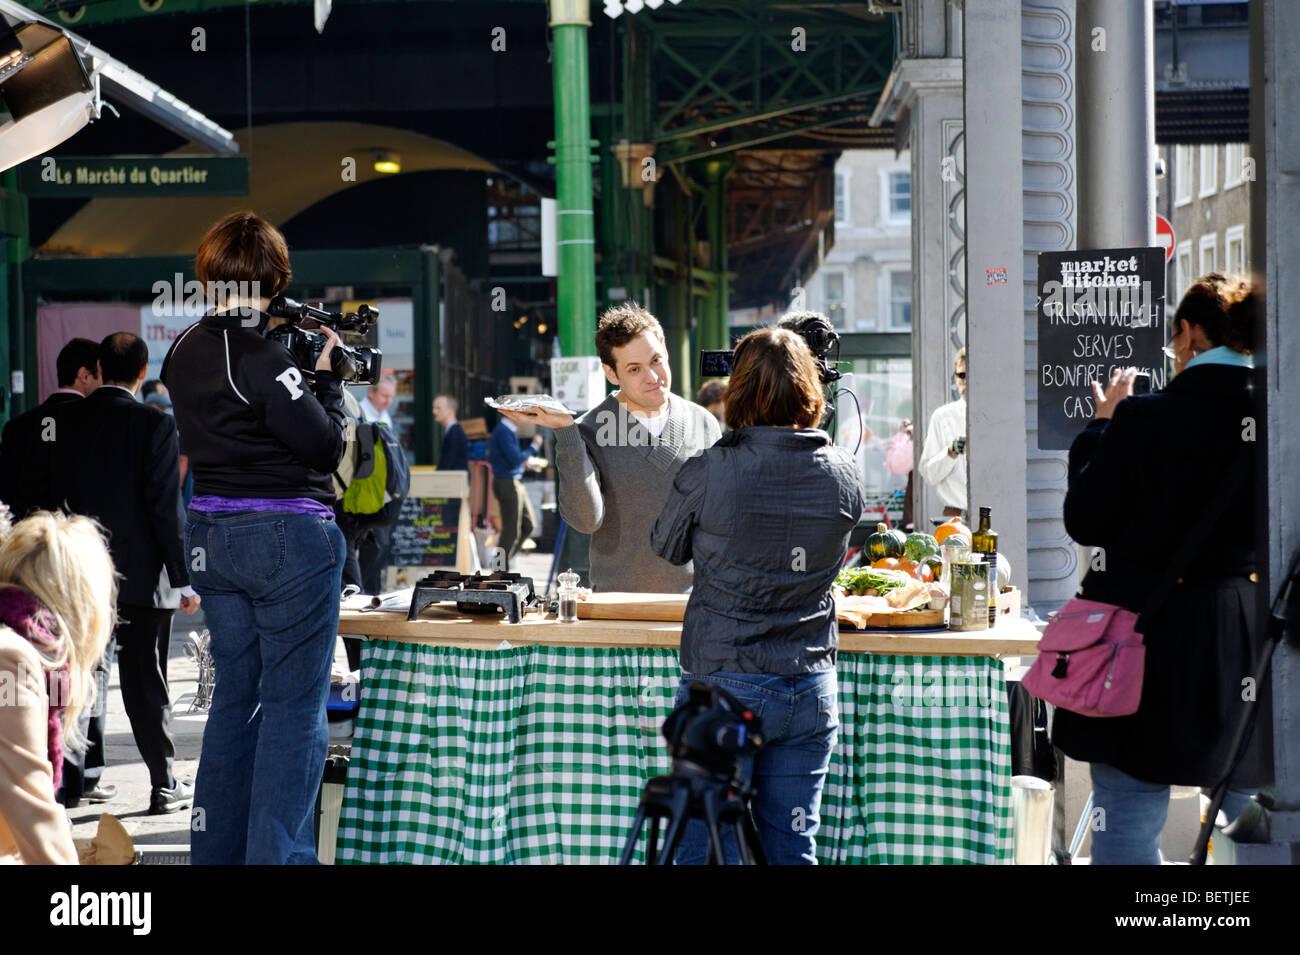 Tristan Welch presenting 'Market kitchen' TV program for UKTV Good Food channel. Borough Market. London. - Stock Image